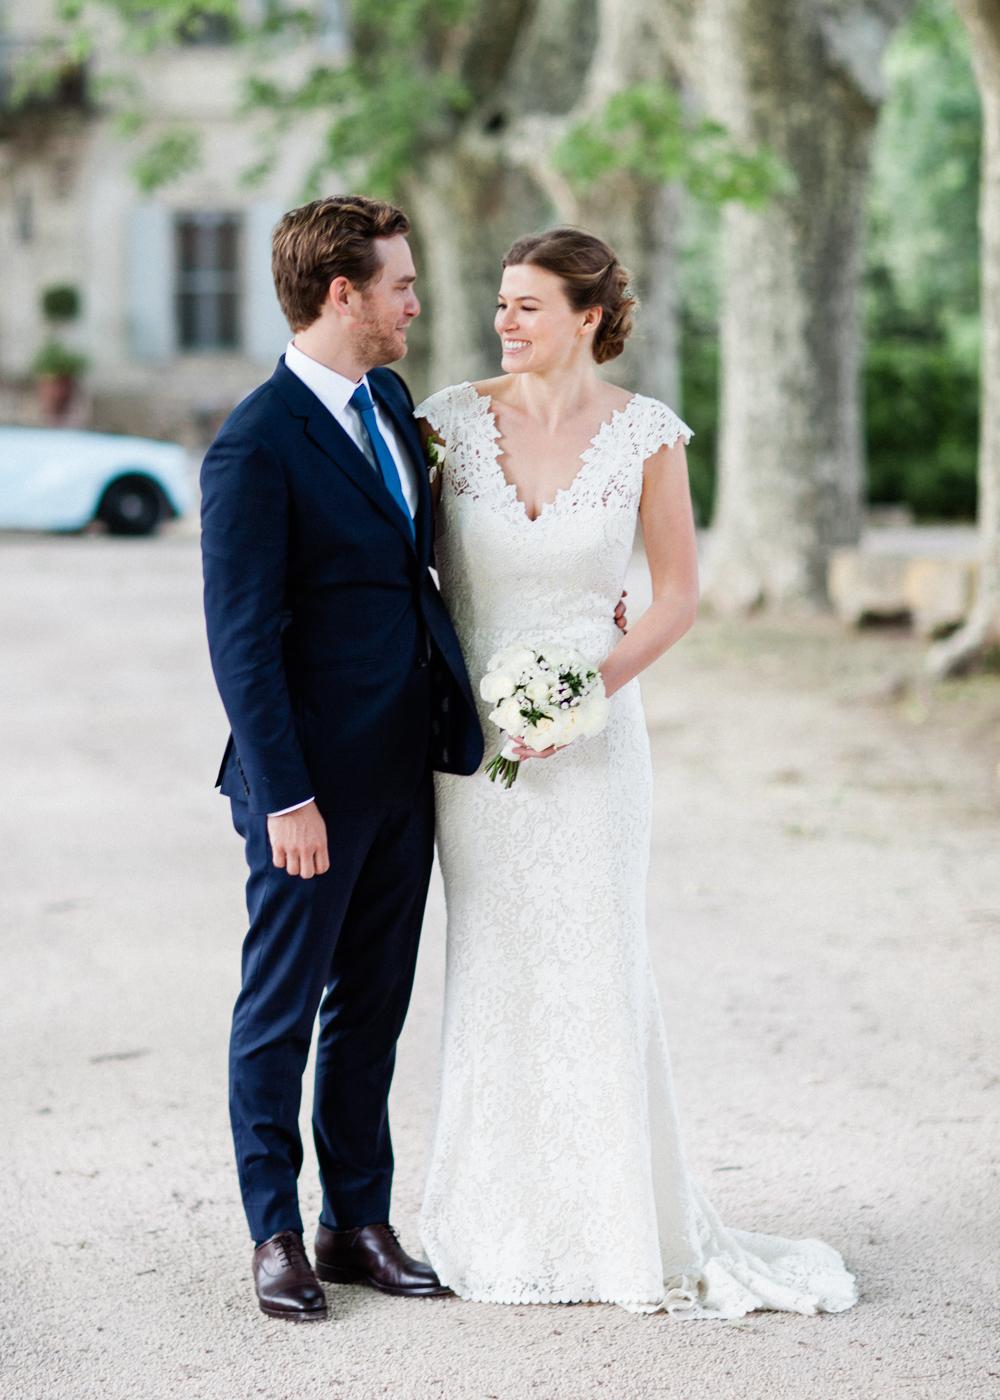 Provence_Wedding_(c)_Rory_Wylie-105.jpg